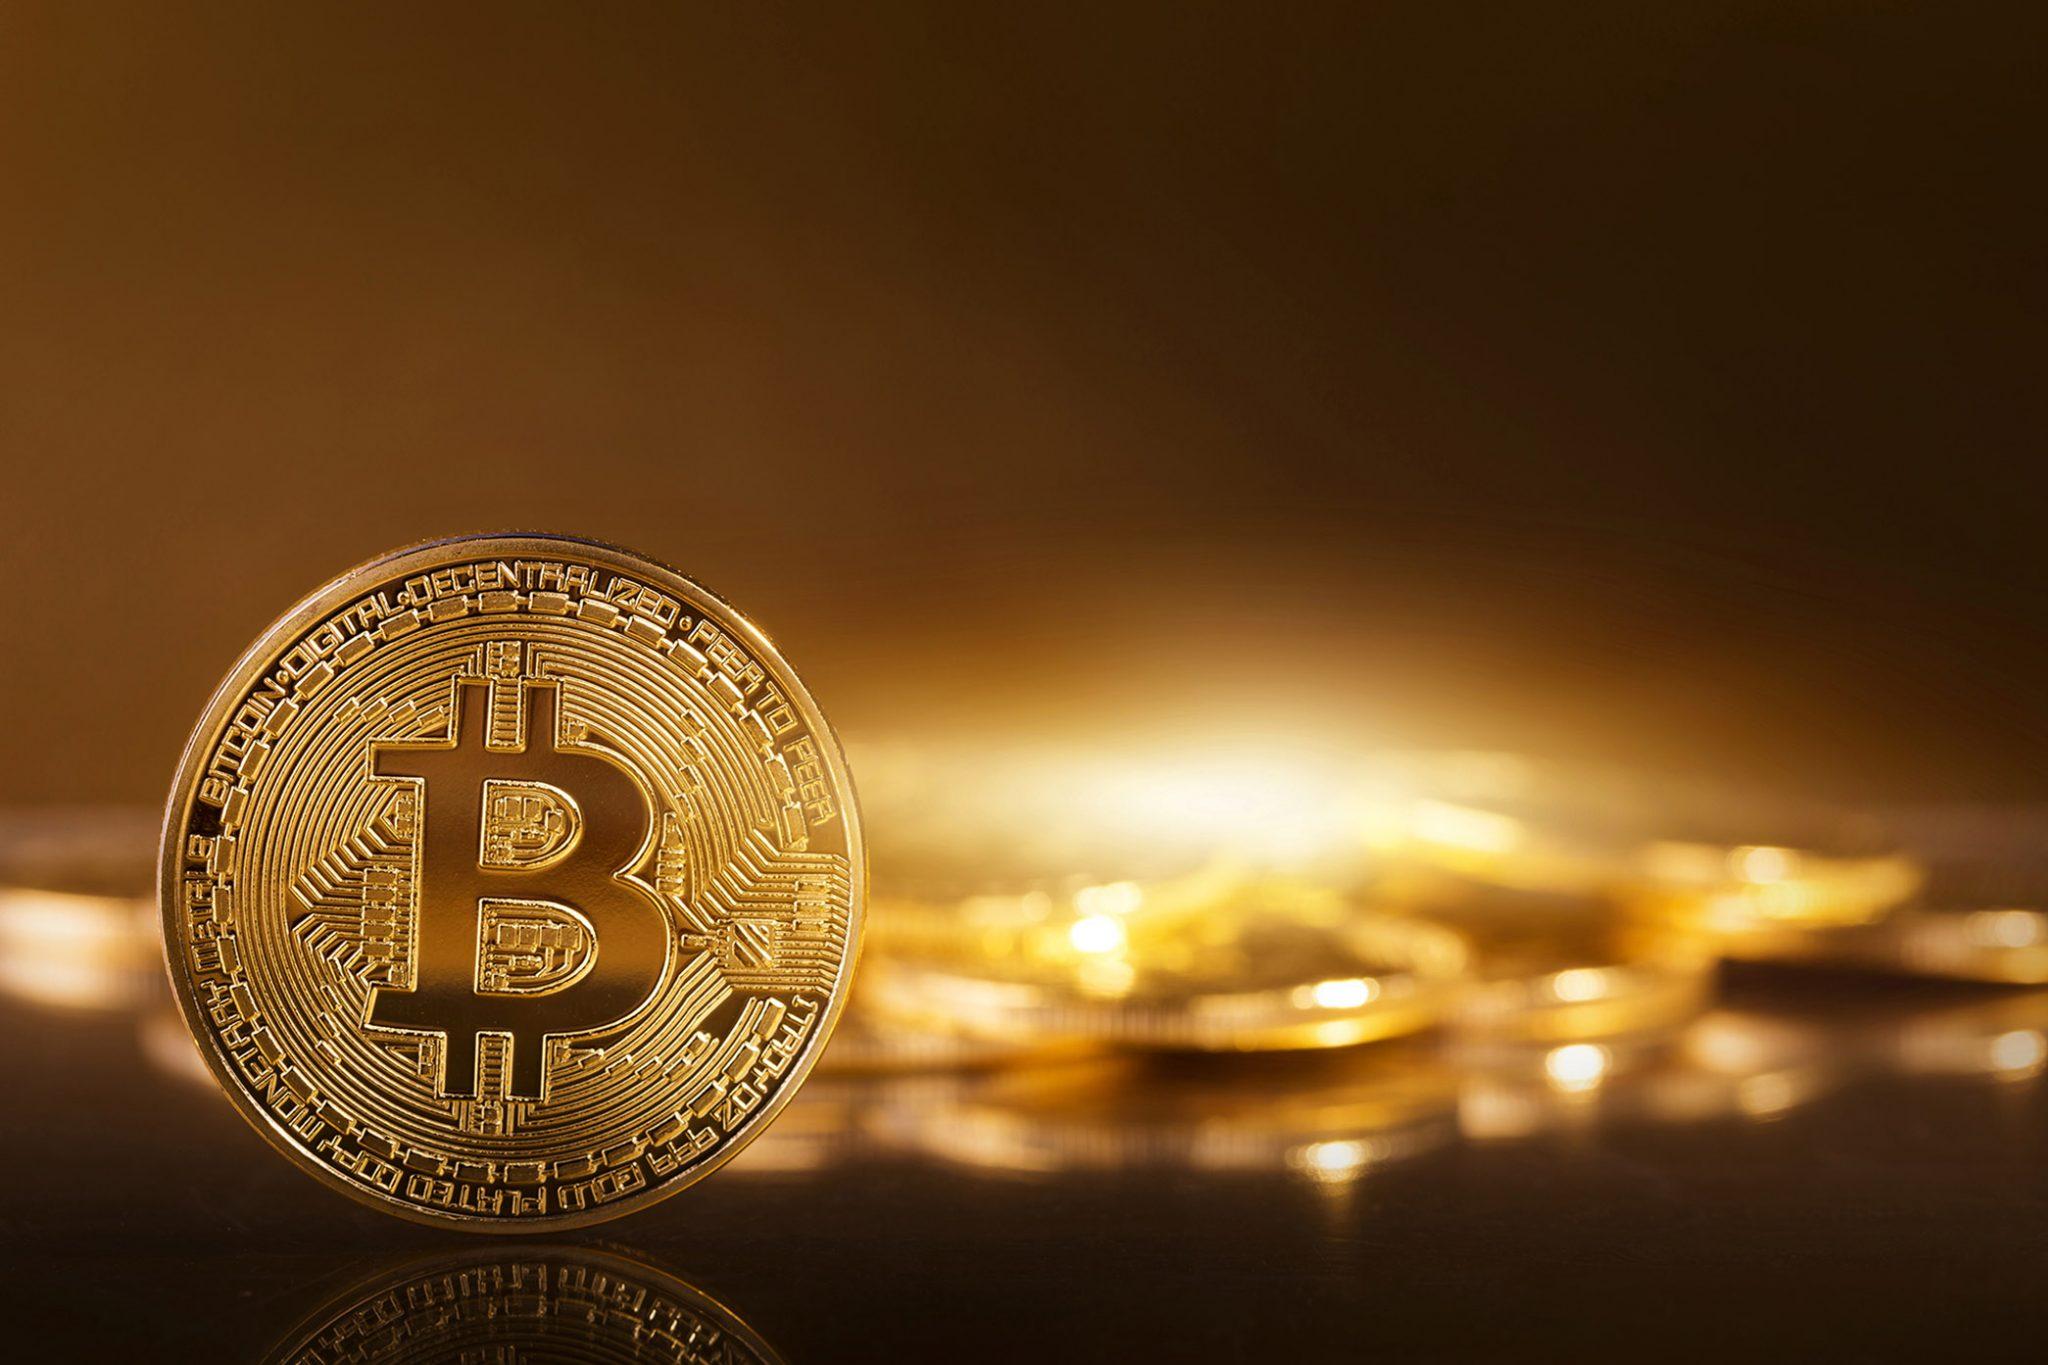 Bitcoin over 20,000